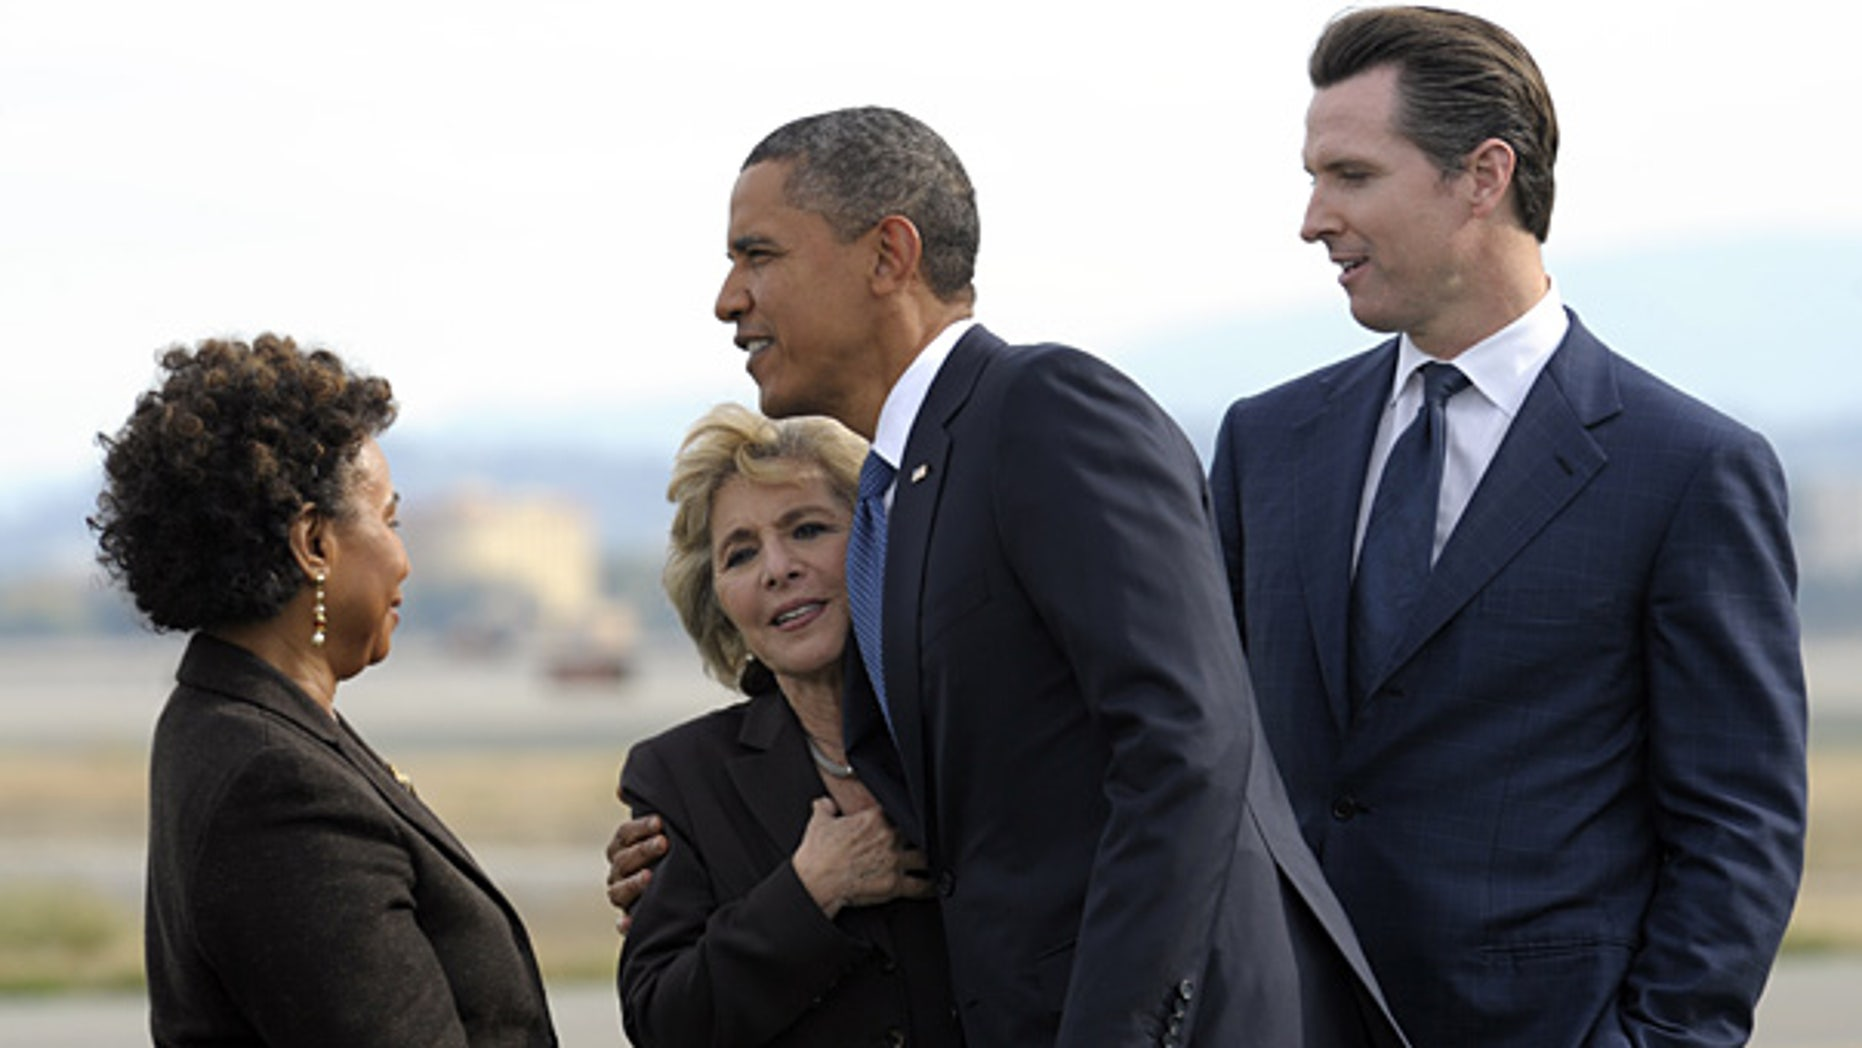 Oct. 21: President Obama greets Sen. Barbara Boxer, D-Calif., as Rep. Barbara Lee, D-Calif., left, and San Francisco Mayor Gavin Newsom watch at San Francisco airport.